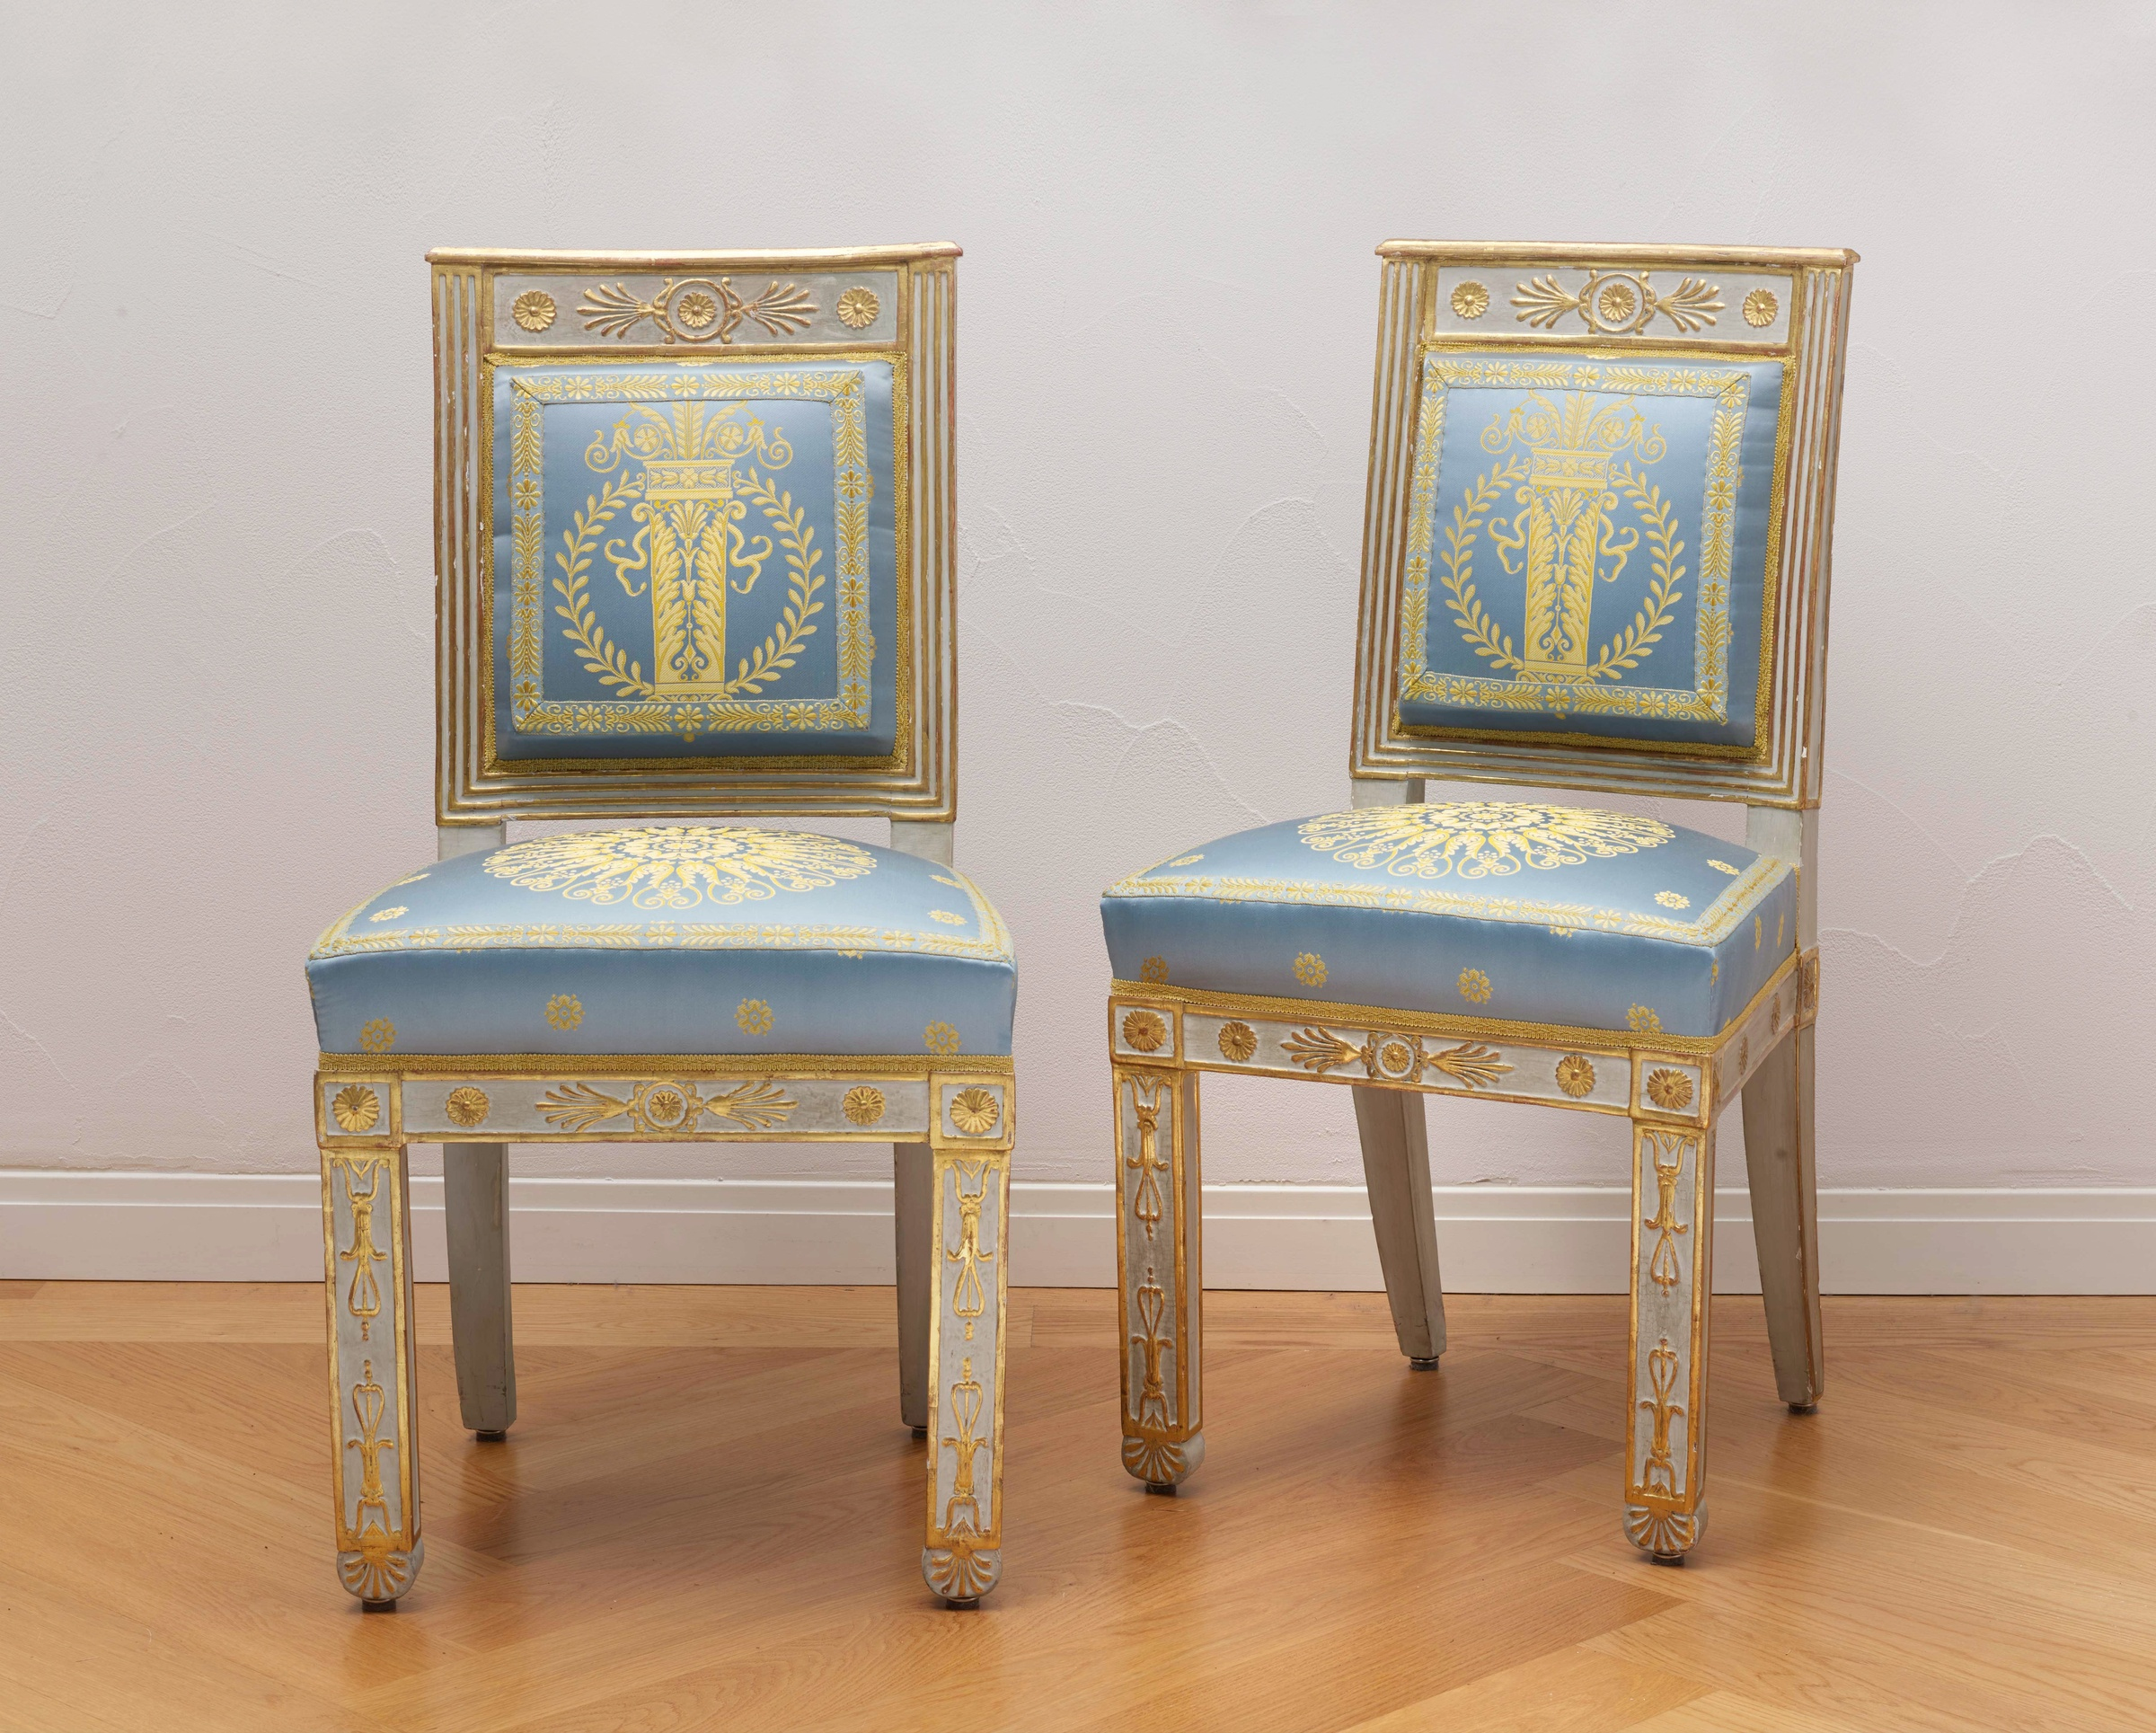 Canapé Ancien Louis Philippe Frais Photographie Pierre Gaston Brion attributed to A Set Of Empire Furniture